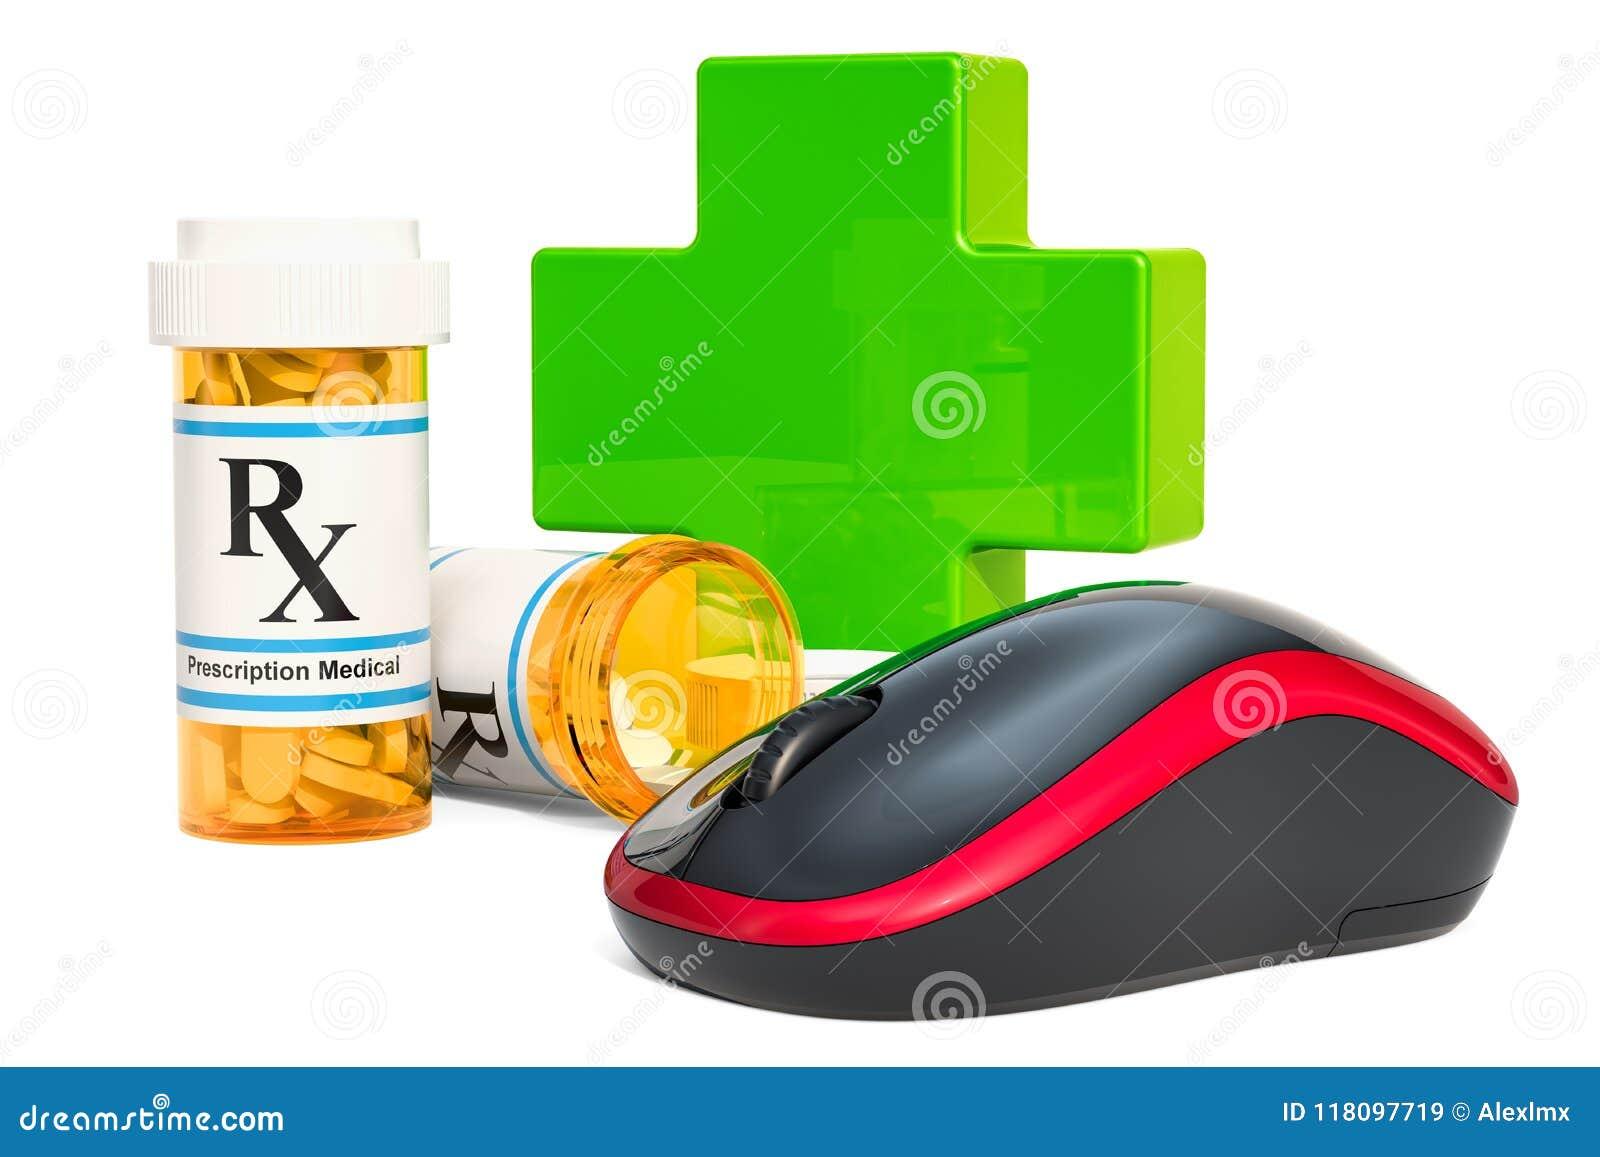 b261c8ad607 Online Drugstore Concept